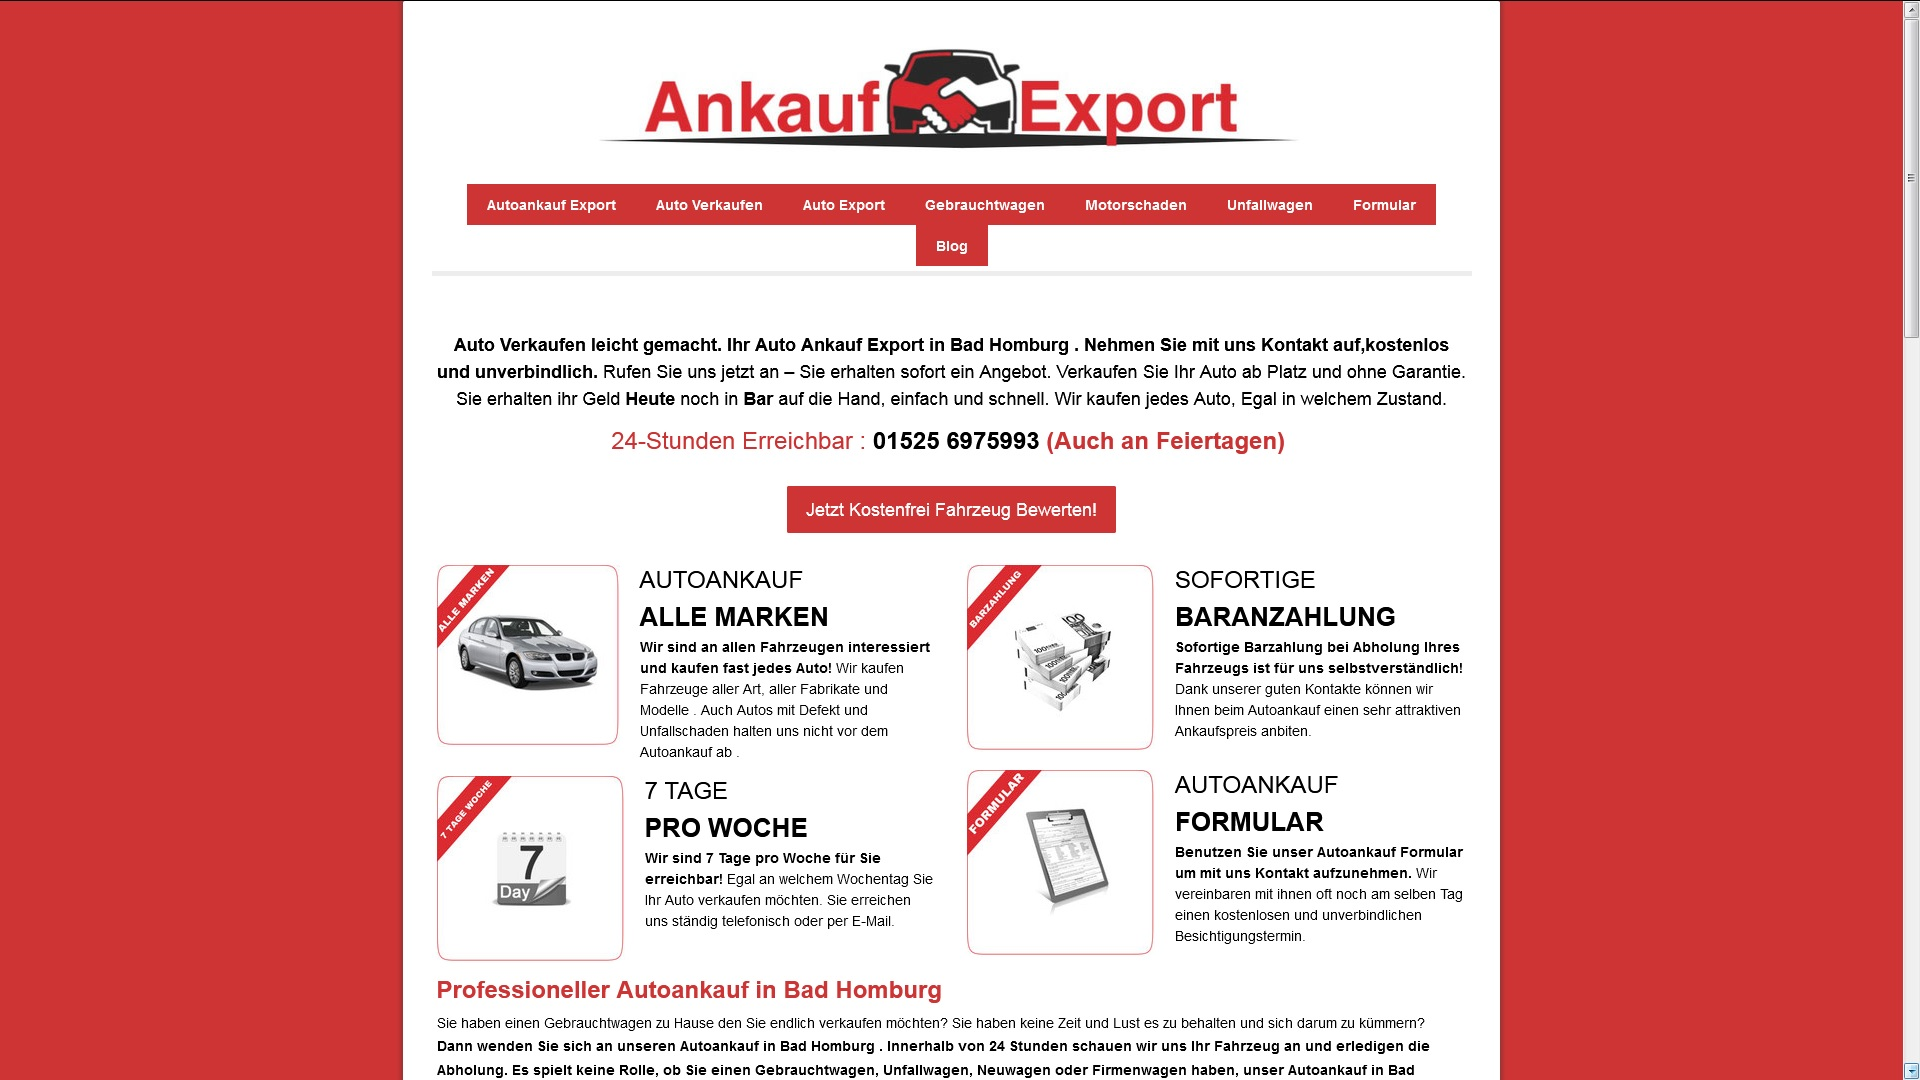 Autoanakuf Cuxhaven